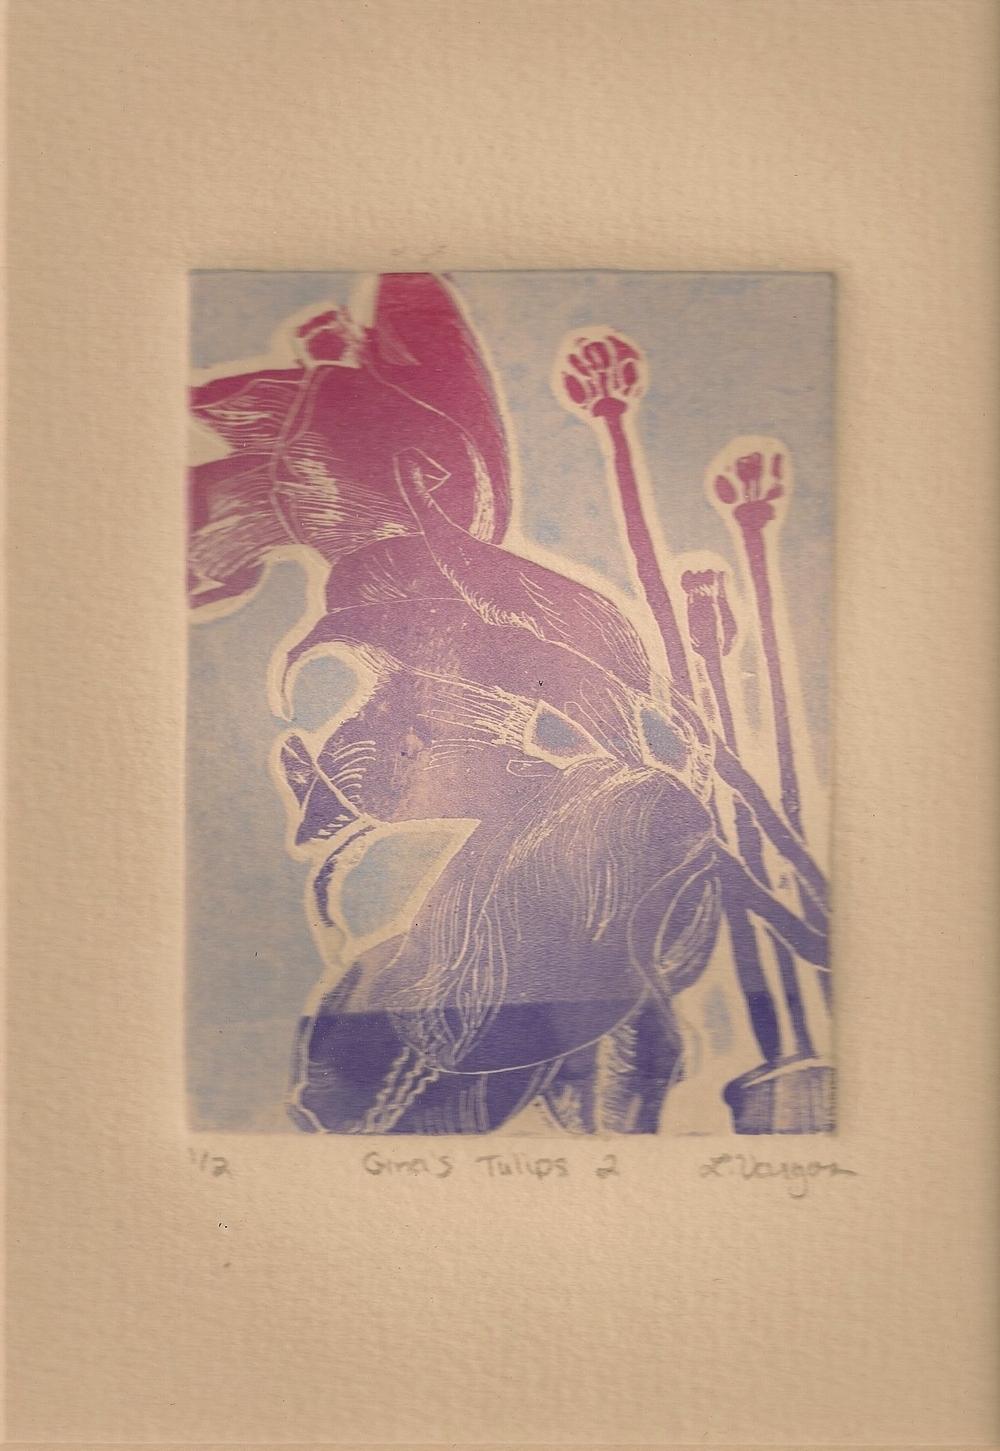 "Gina's Tulips 2, 2 3/4x3 7/8"", etching, 2010"